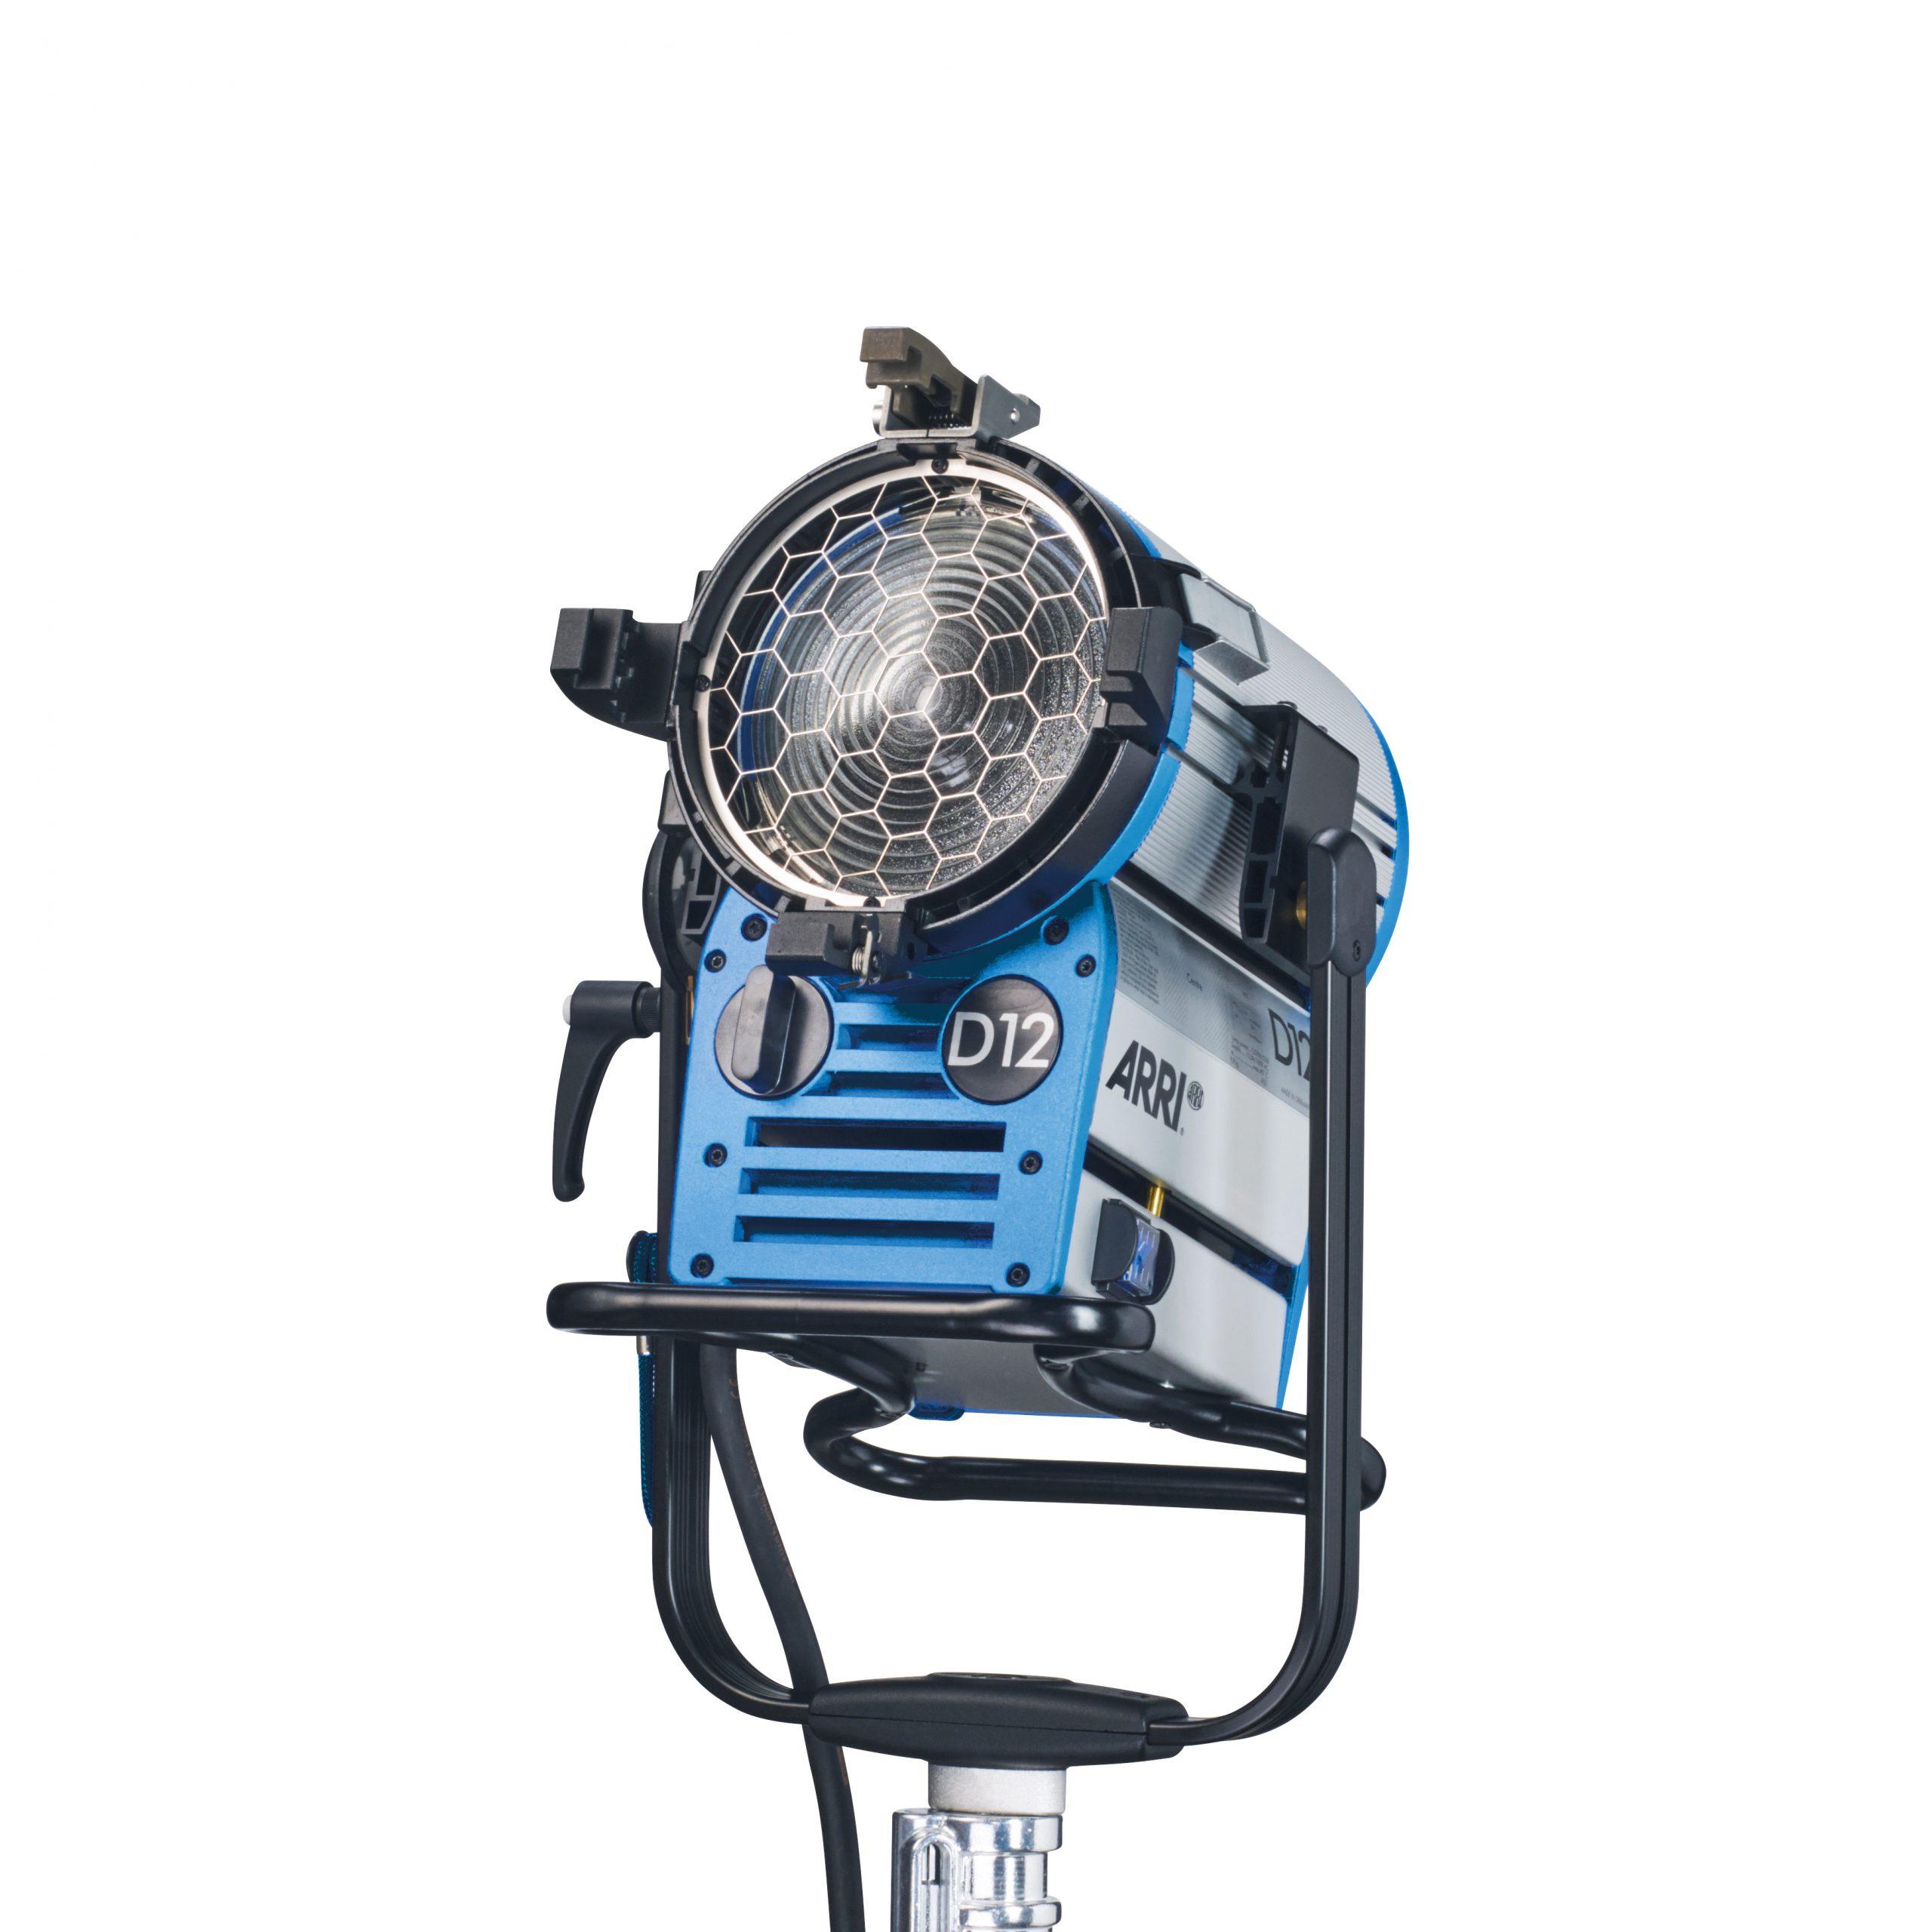 ARRI True Blue D12, MAN, VEAM, blue silver